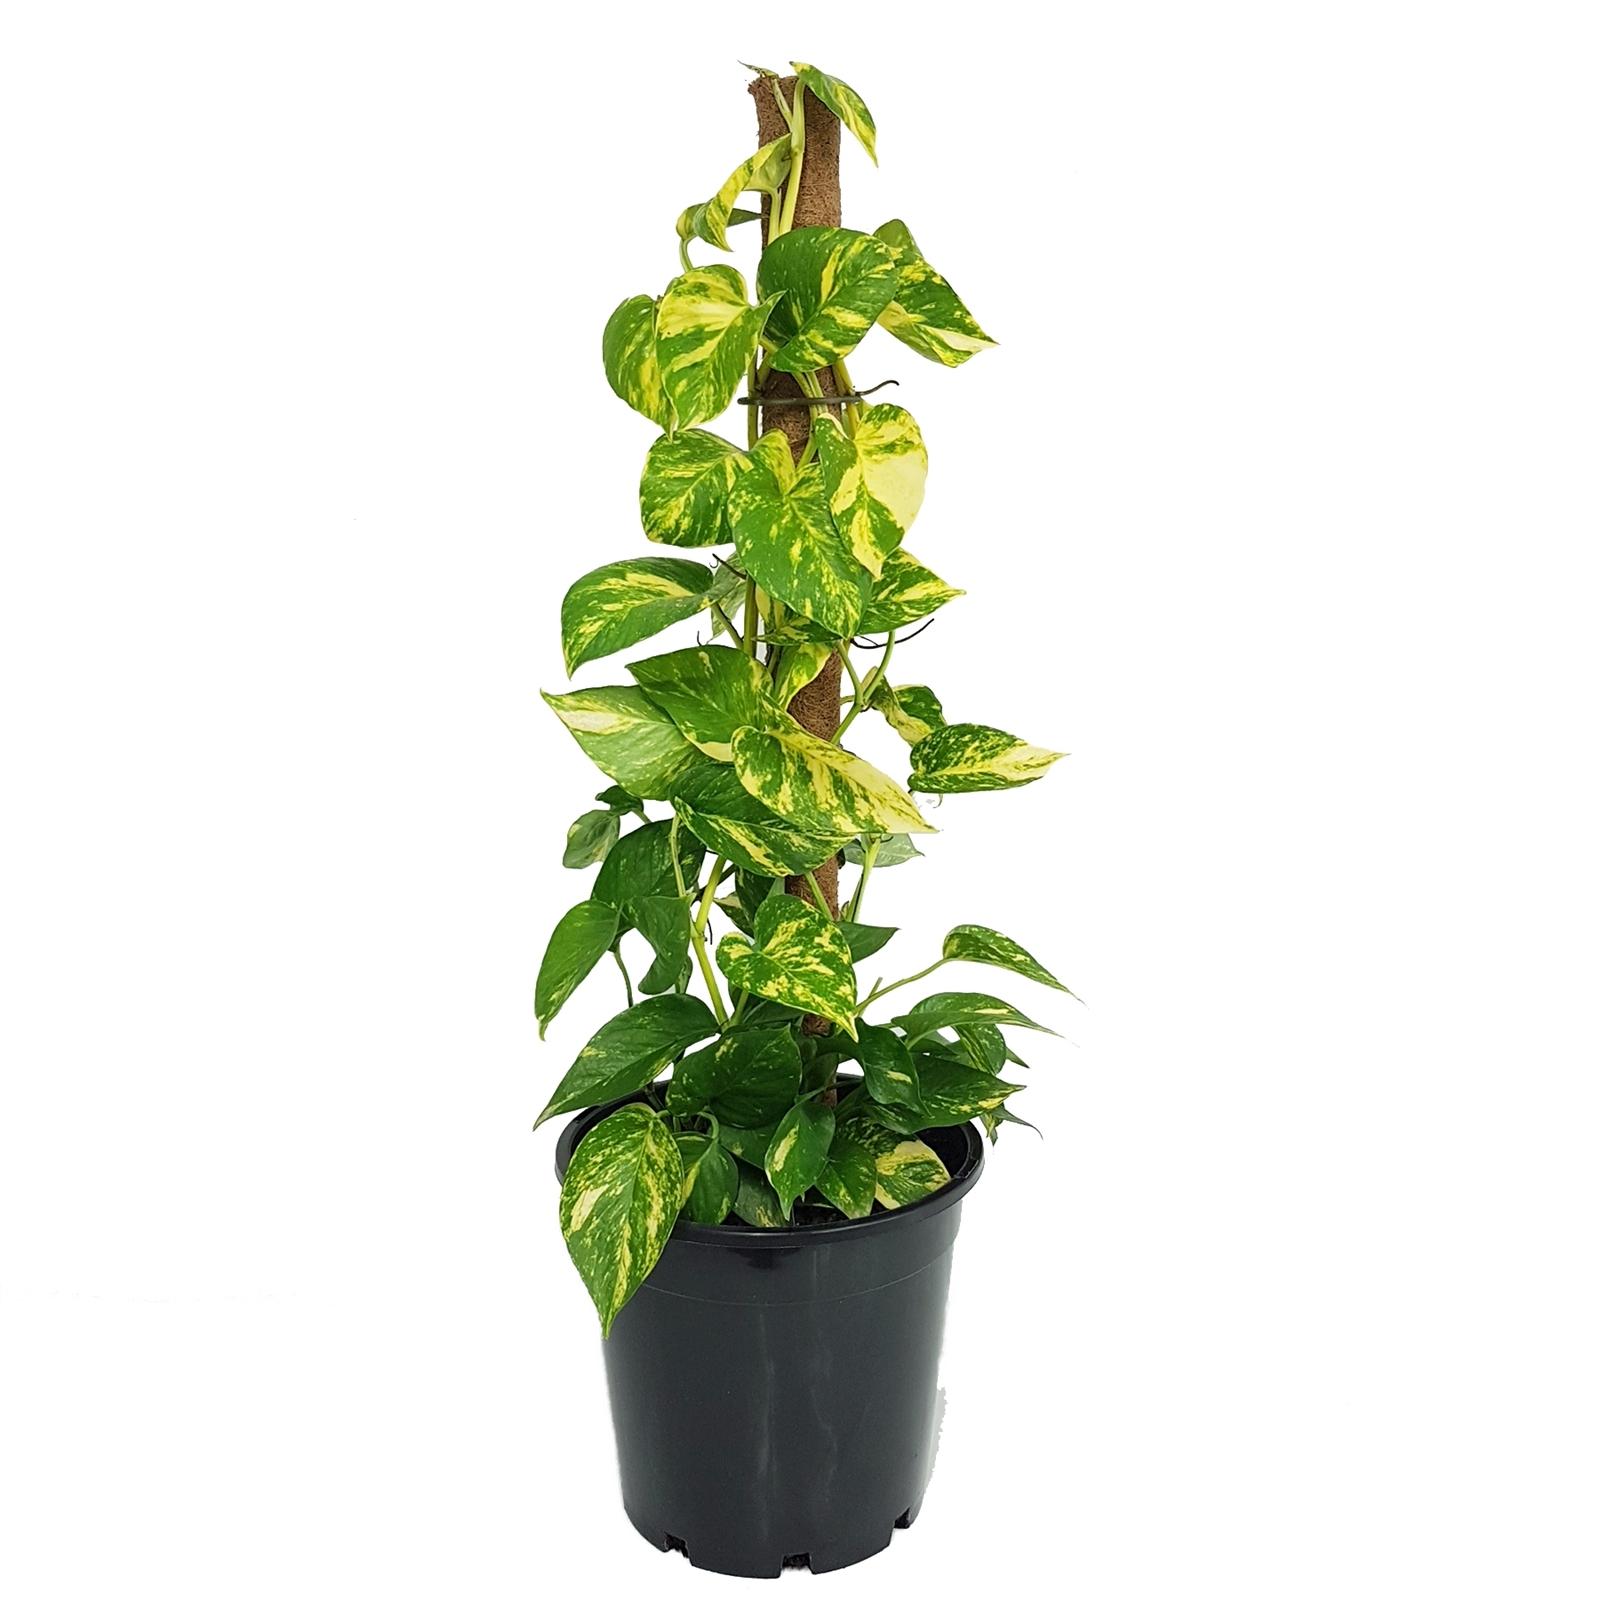 20mm Devils Ivy Pothos   Epipremnum auruem   Bunnings Australia